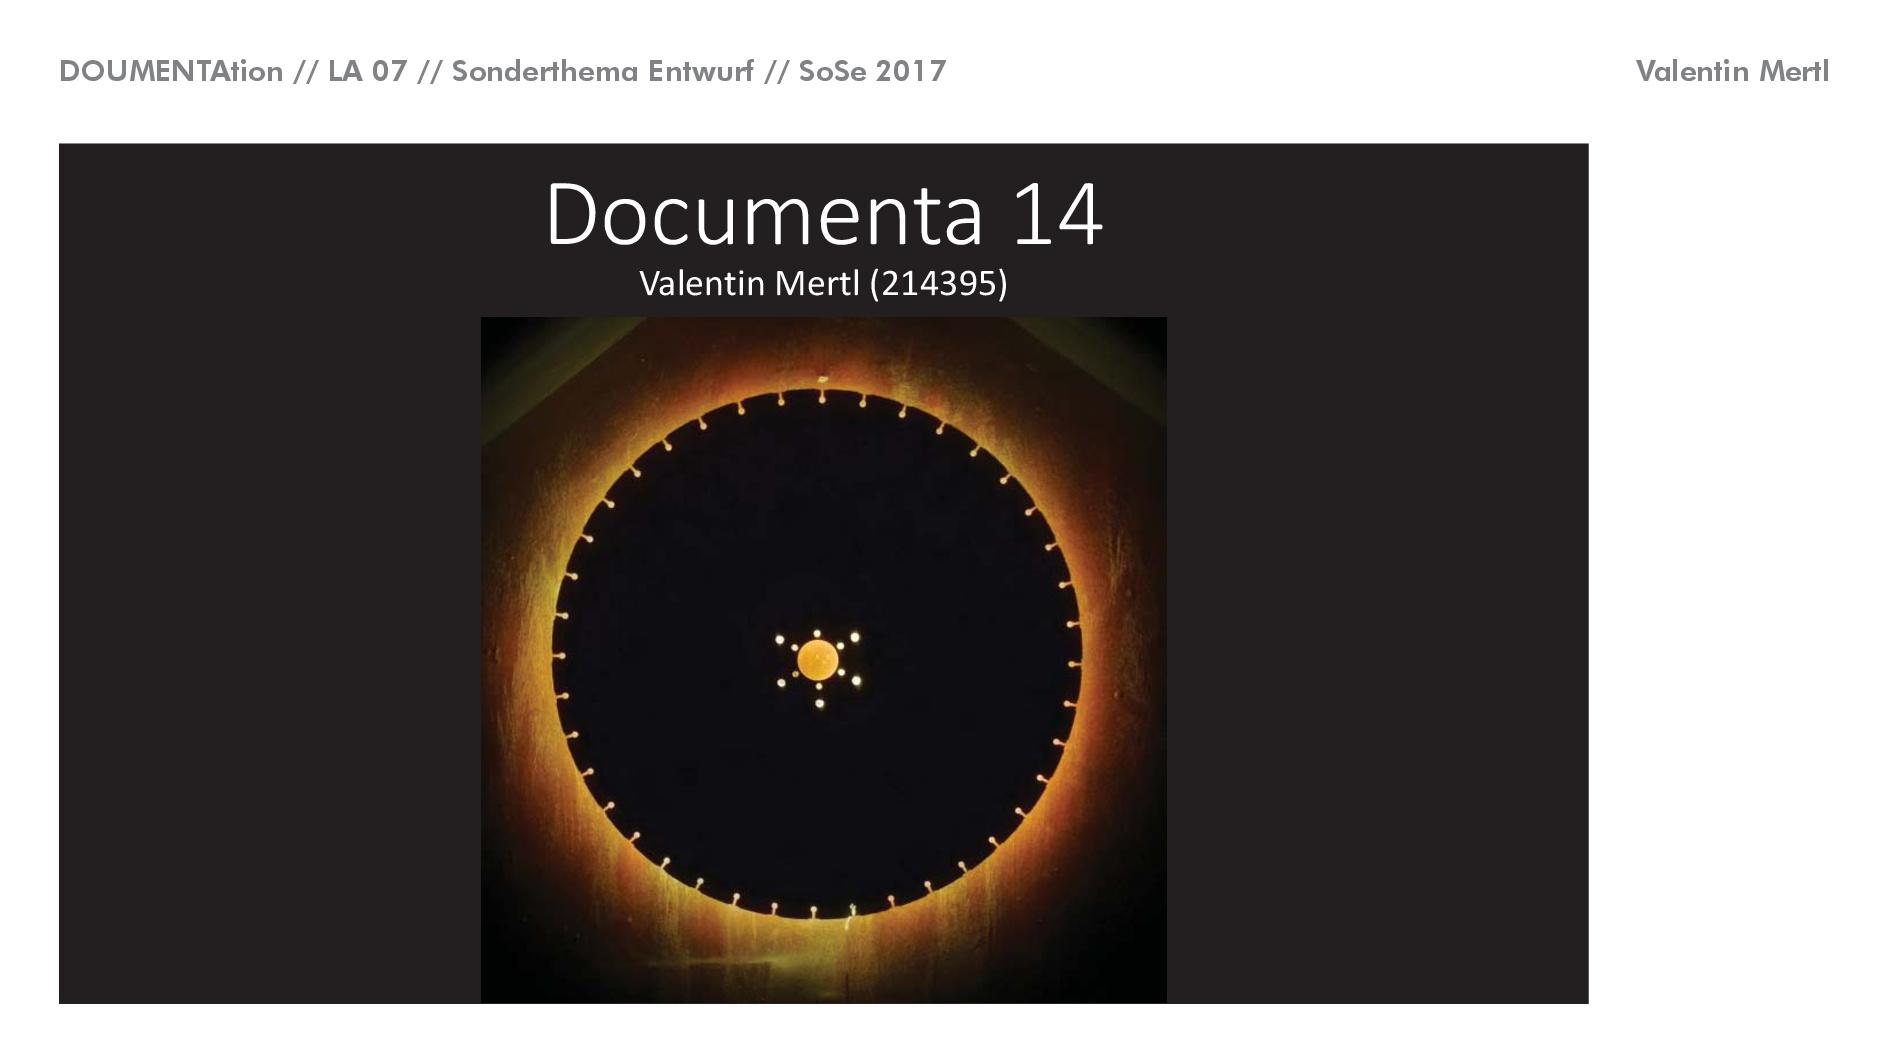 NEU Sonderthema Entwerfen SoSe 17 012